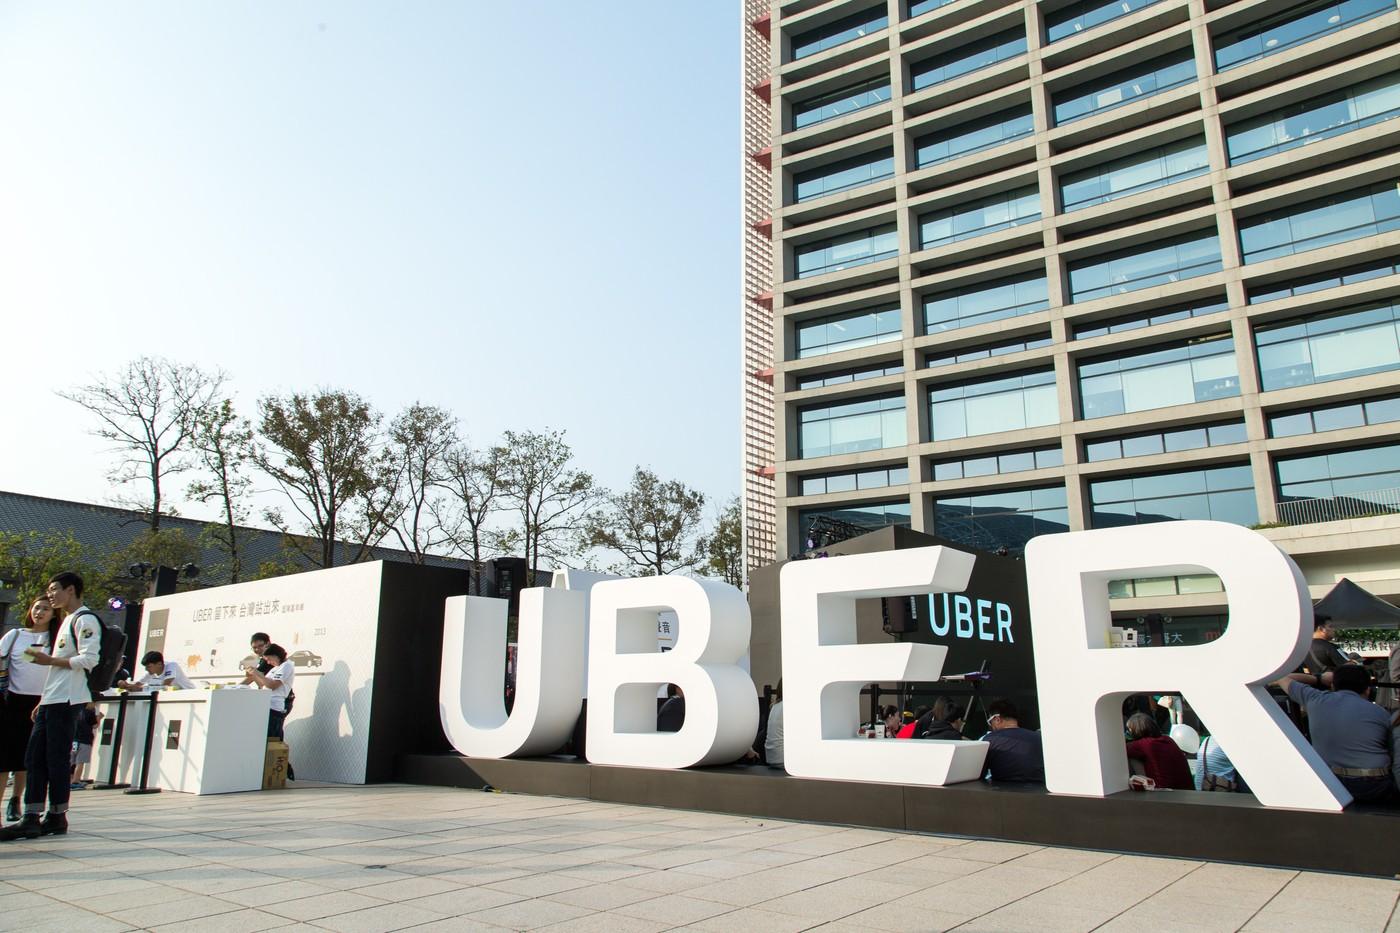 我們該同情Uber被勒令歇業嗎?